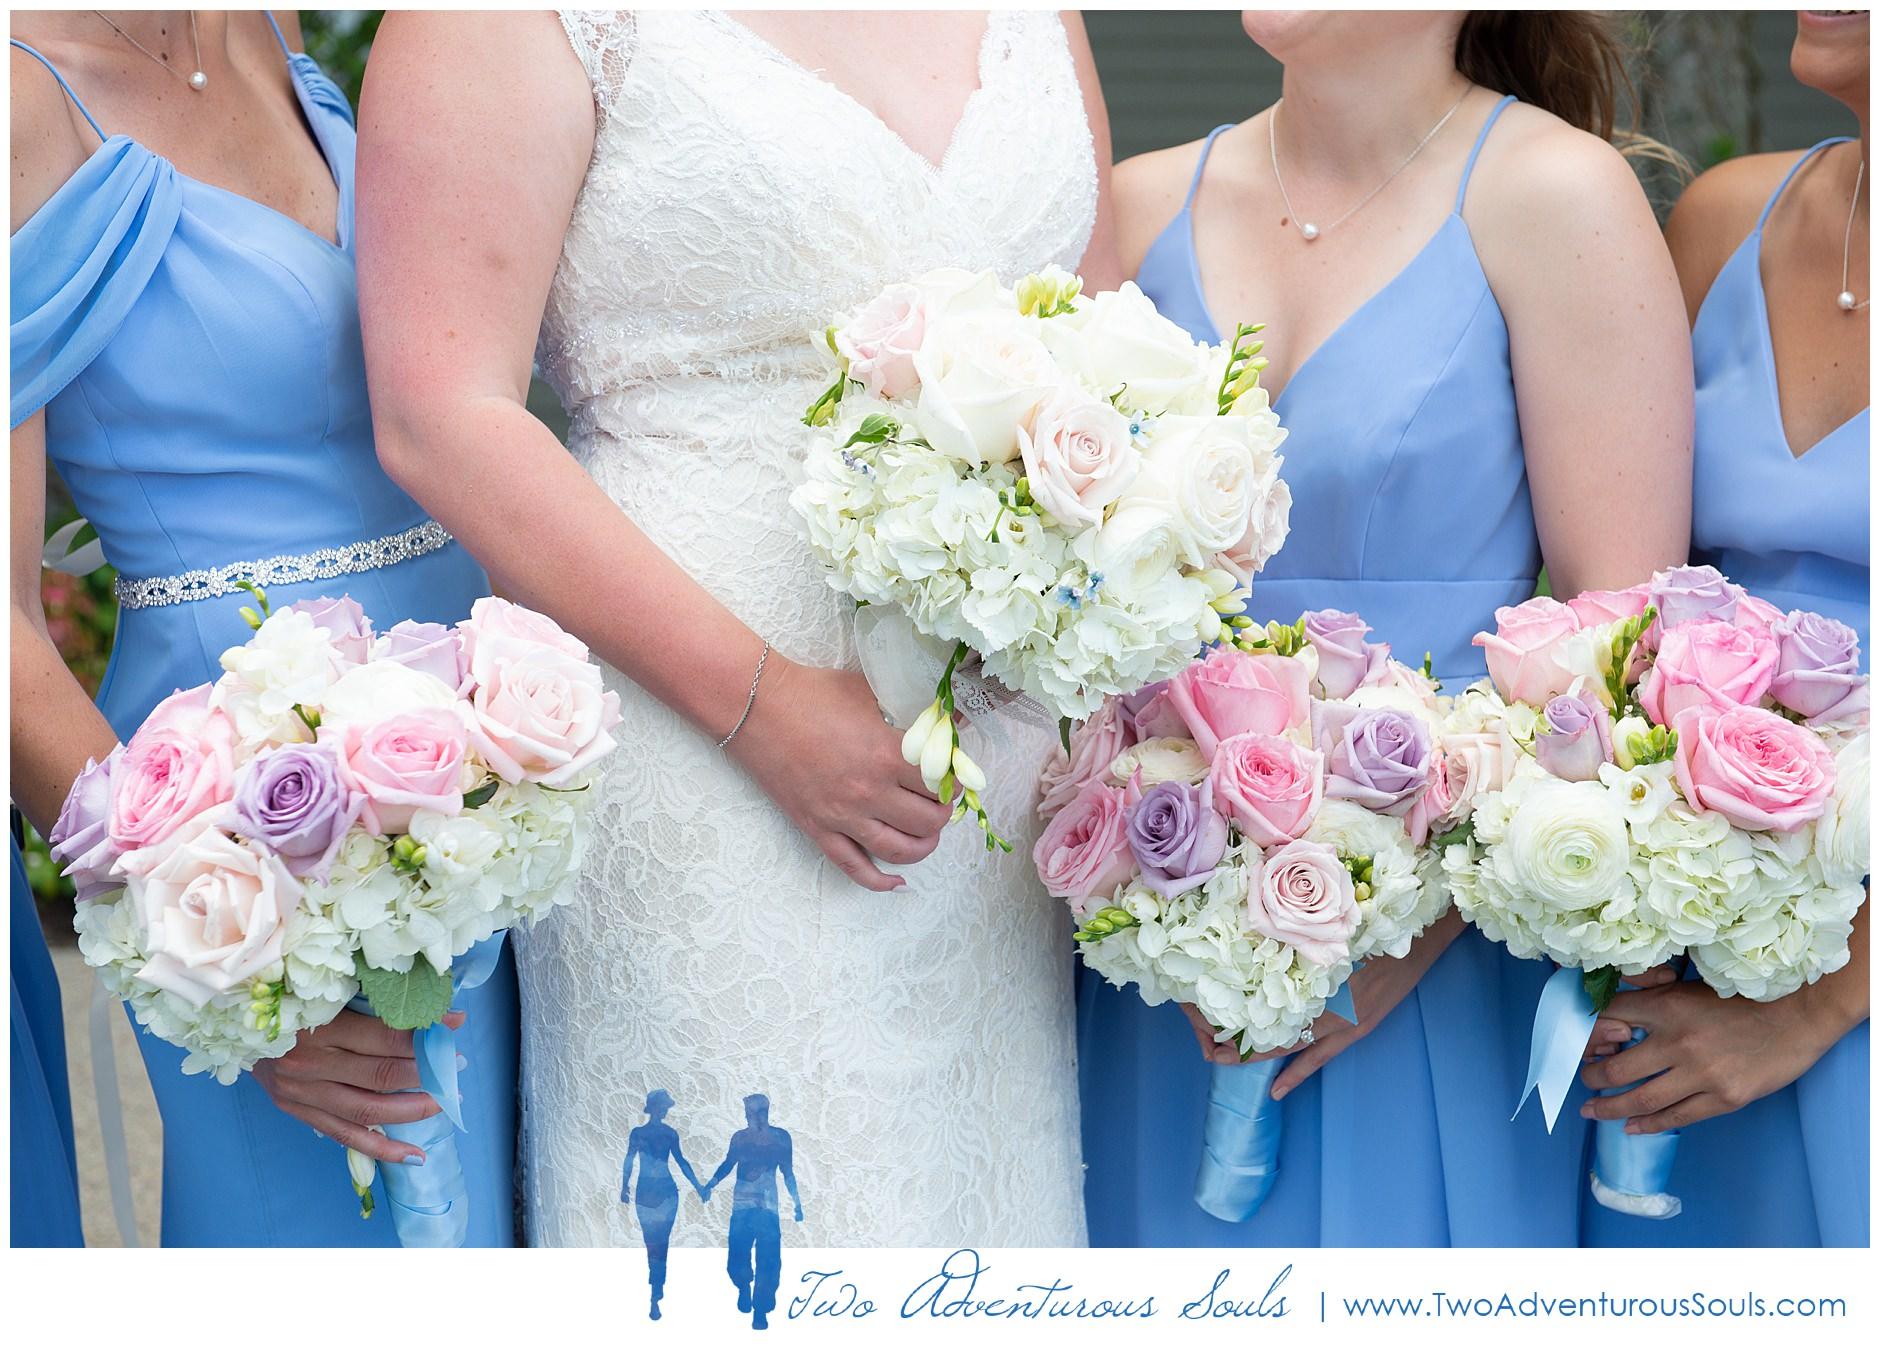 Cape Cod Wedding Photographers, Destination Wedding Photographers, Two Adventurous Souls-081019_0031.jpg